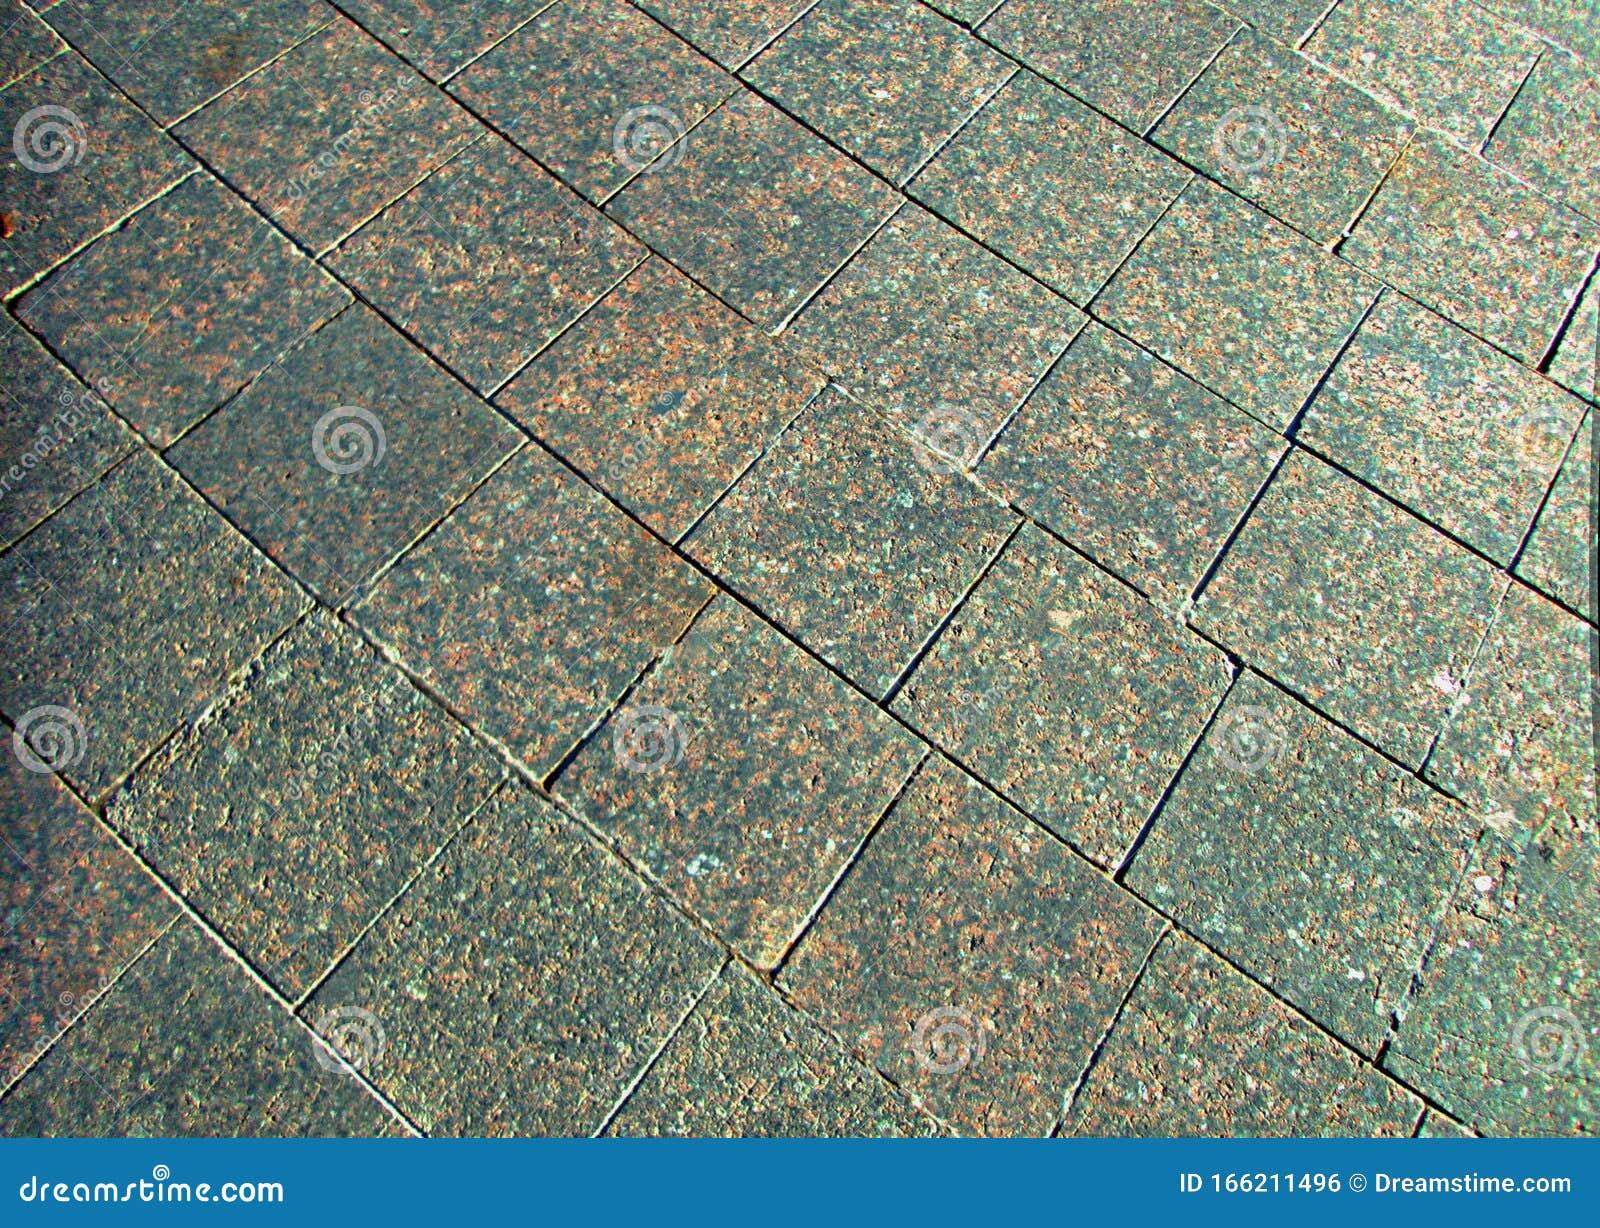 https www dreamstime com granite stone tiles new city park beautiful floor image166211496